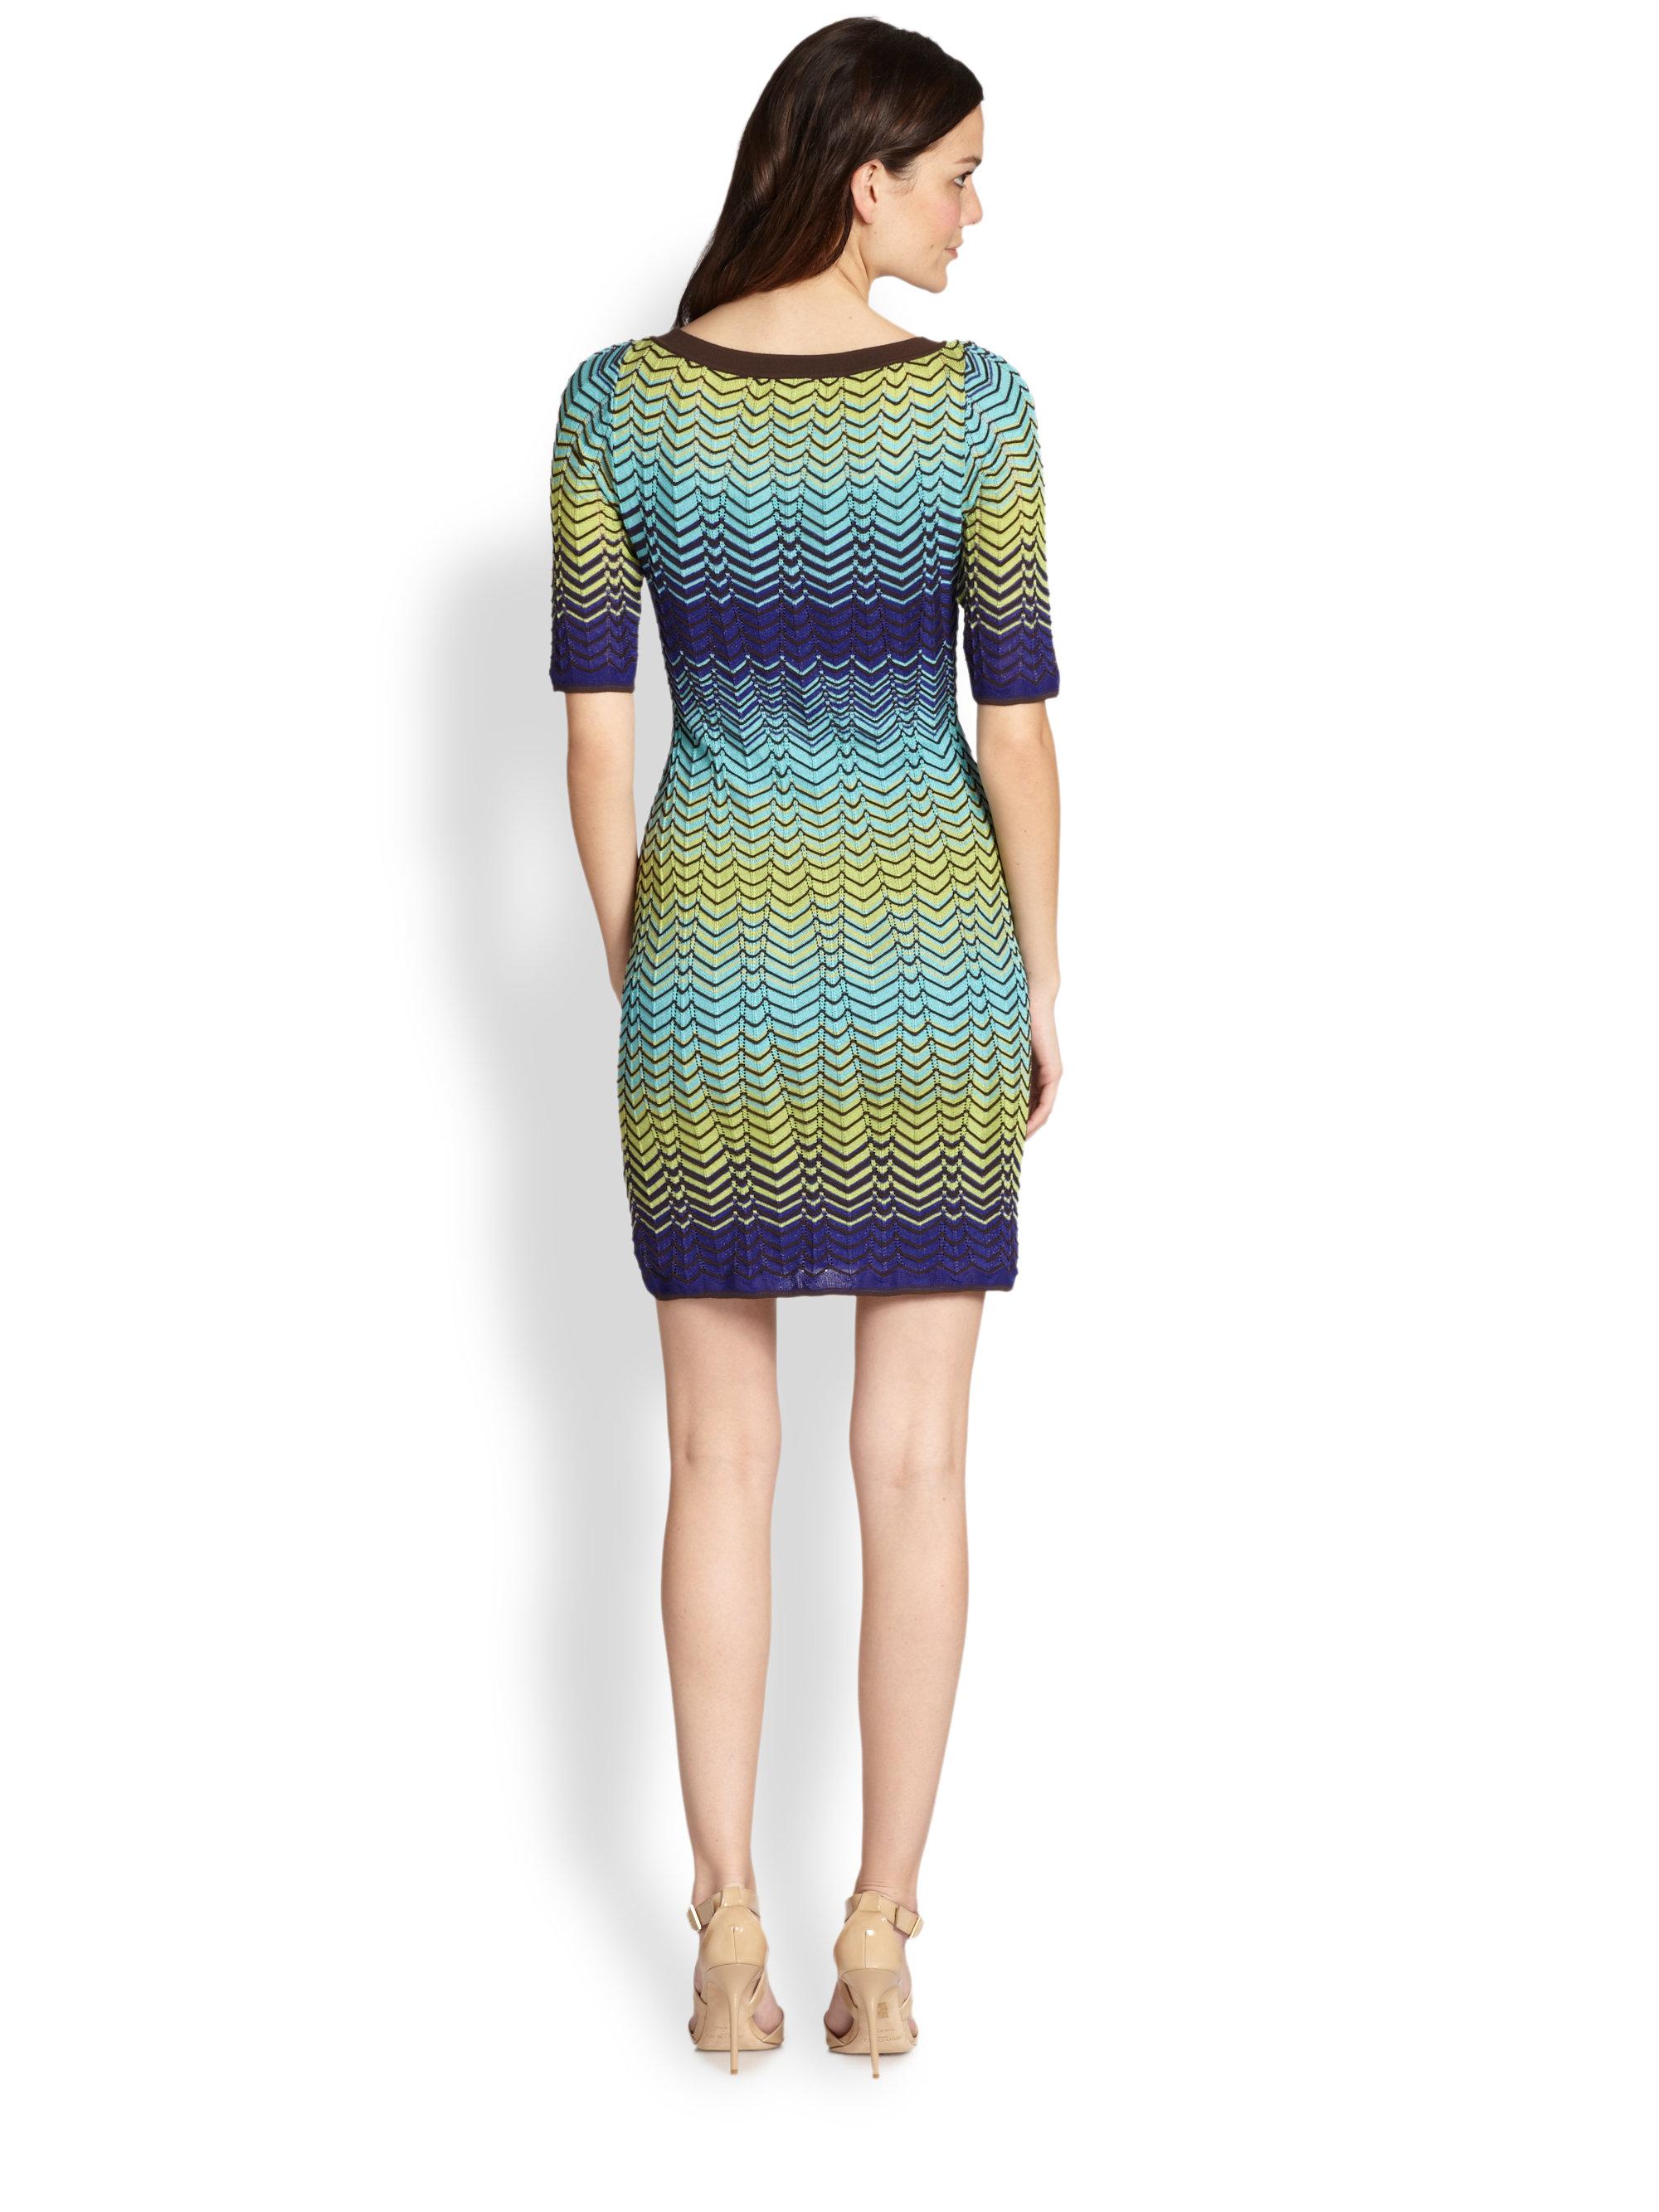 Zigzag knitted dress Missoni Sale Browse Release Dates Online Visa Payment Sale Online mDlSGbT